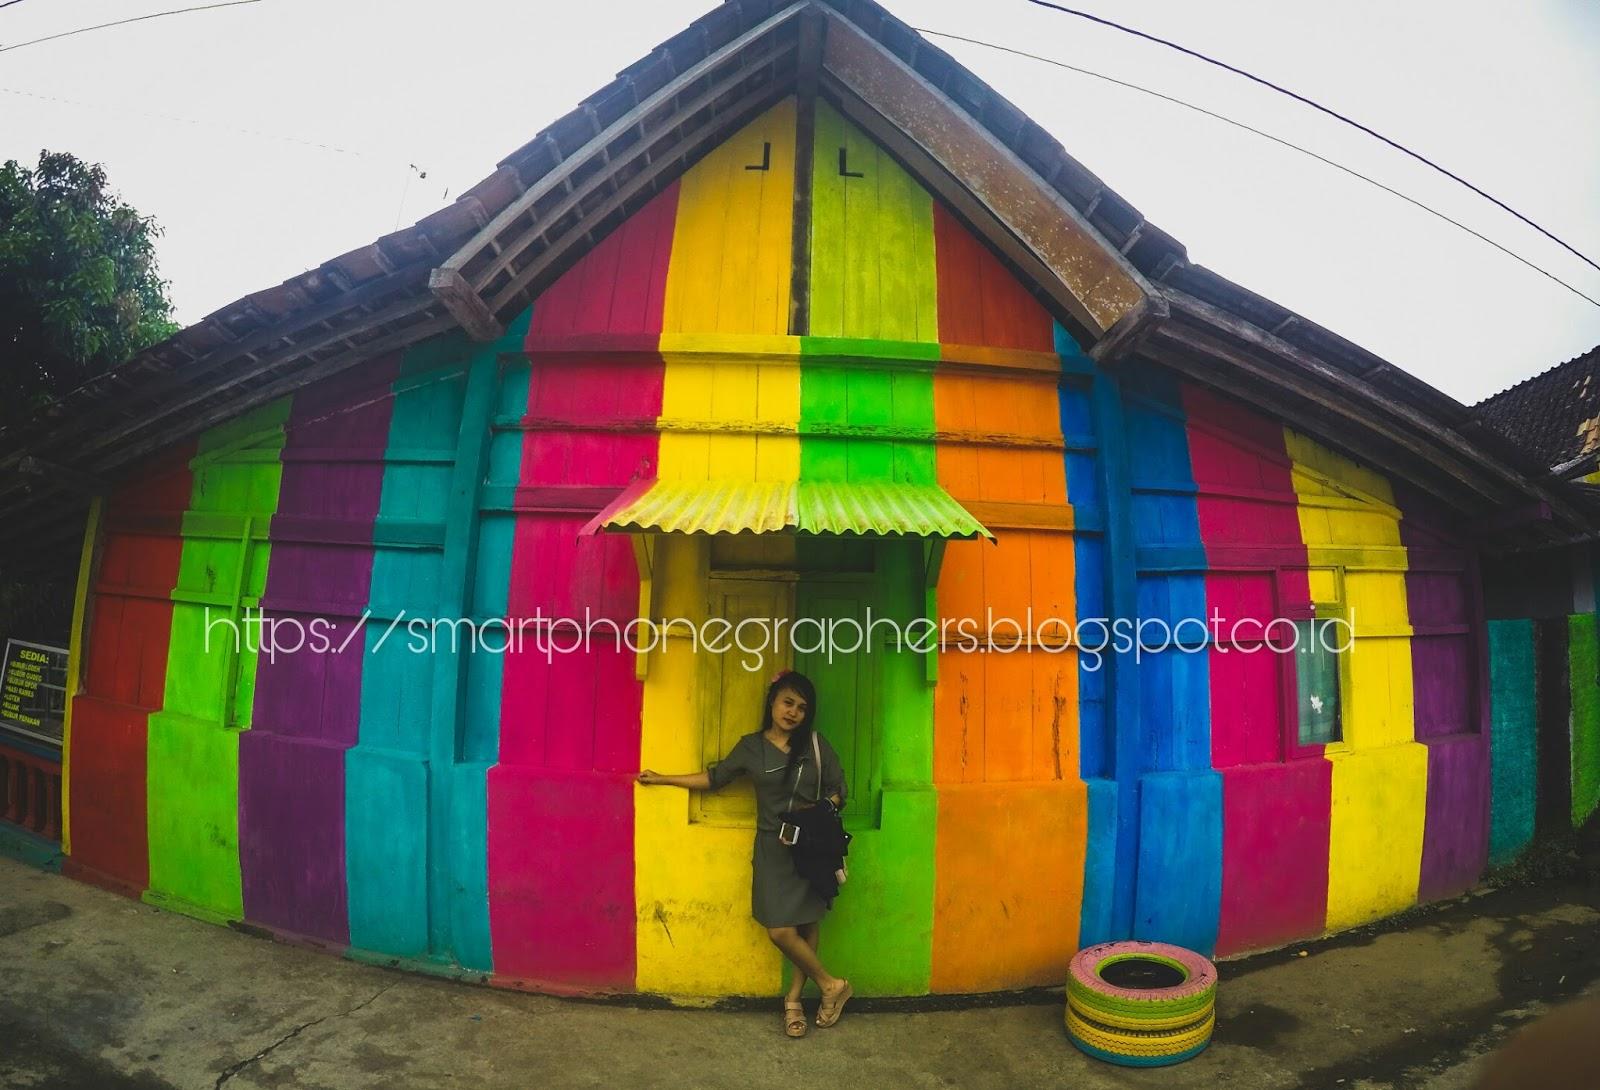 Warna Warni Kampung Pelangi Bejalen Ambarawa Smartphonegraphers Wisata Krisan Clapar